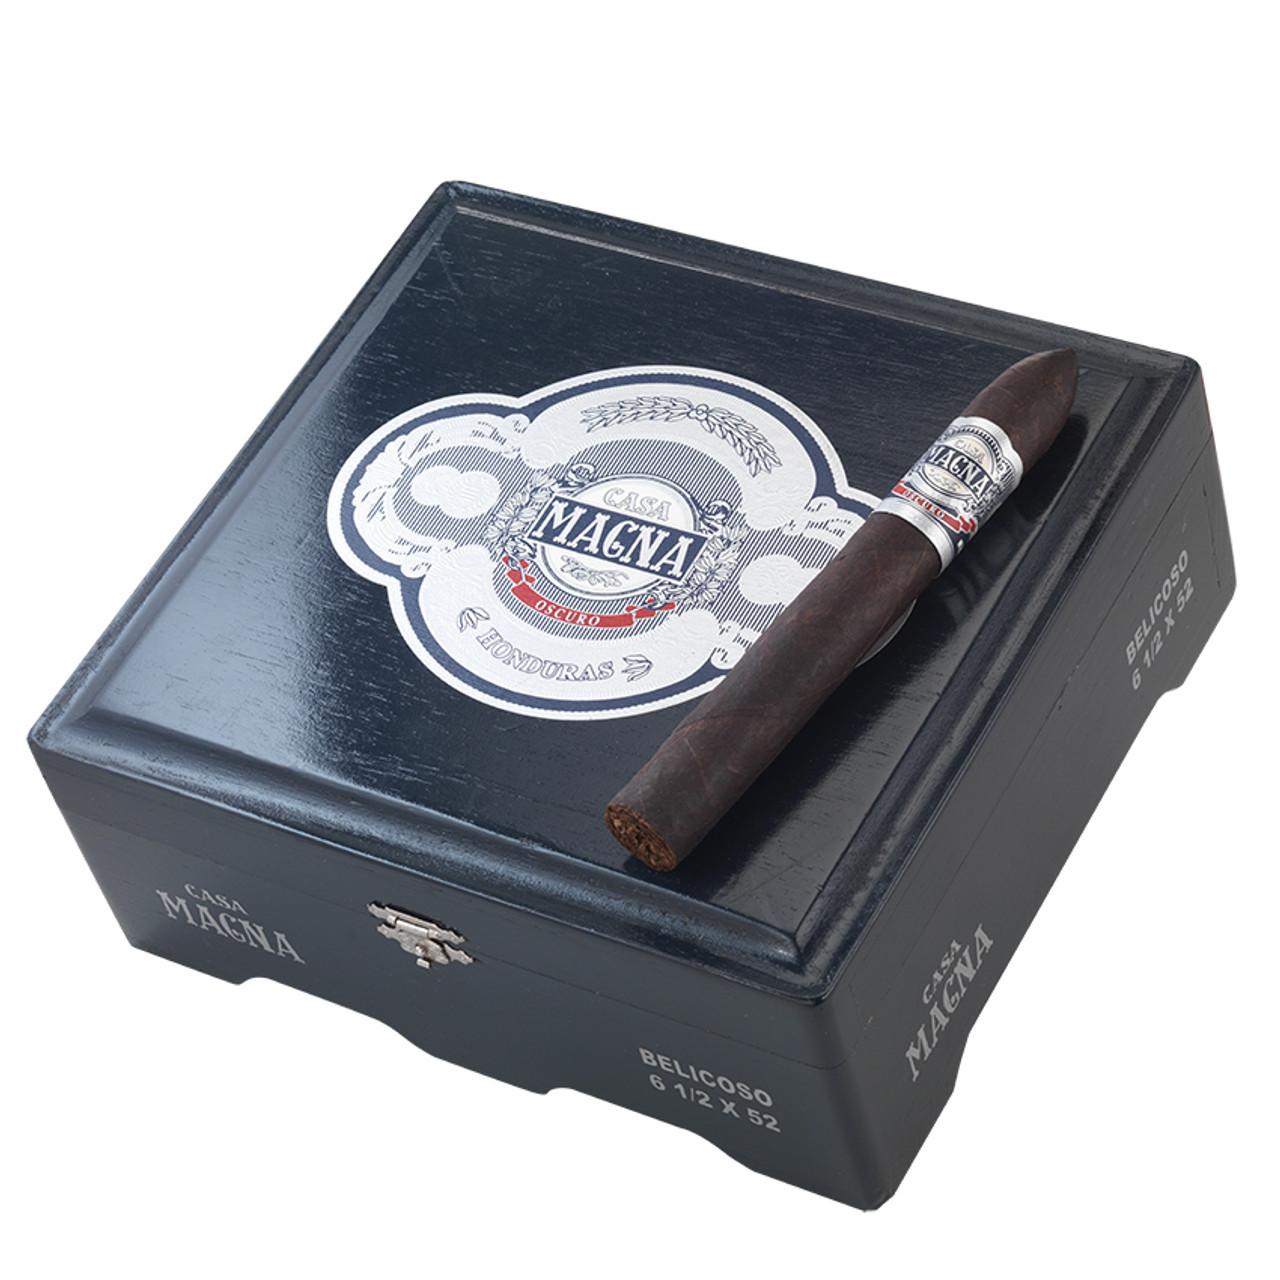 Casa Magna Ocsuro Belicoso Cigars - 6 1/2 x 54 (Box of 27)